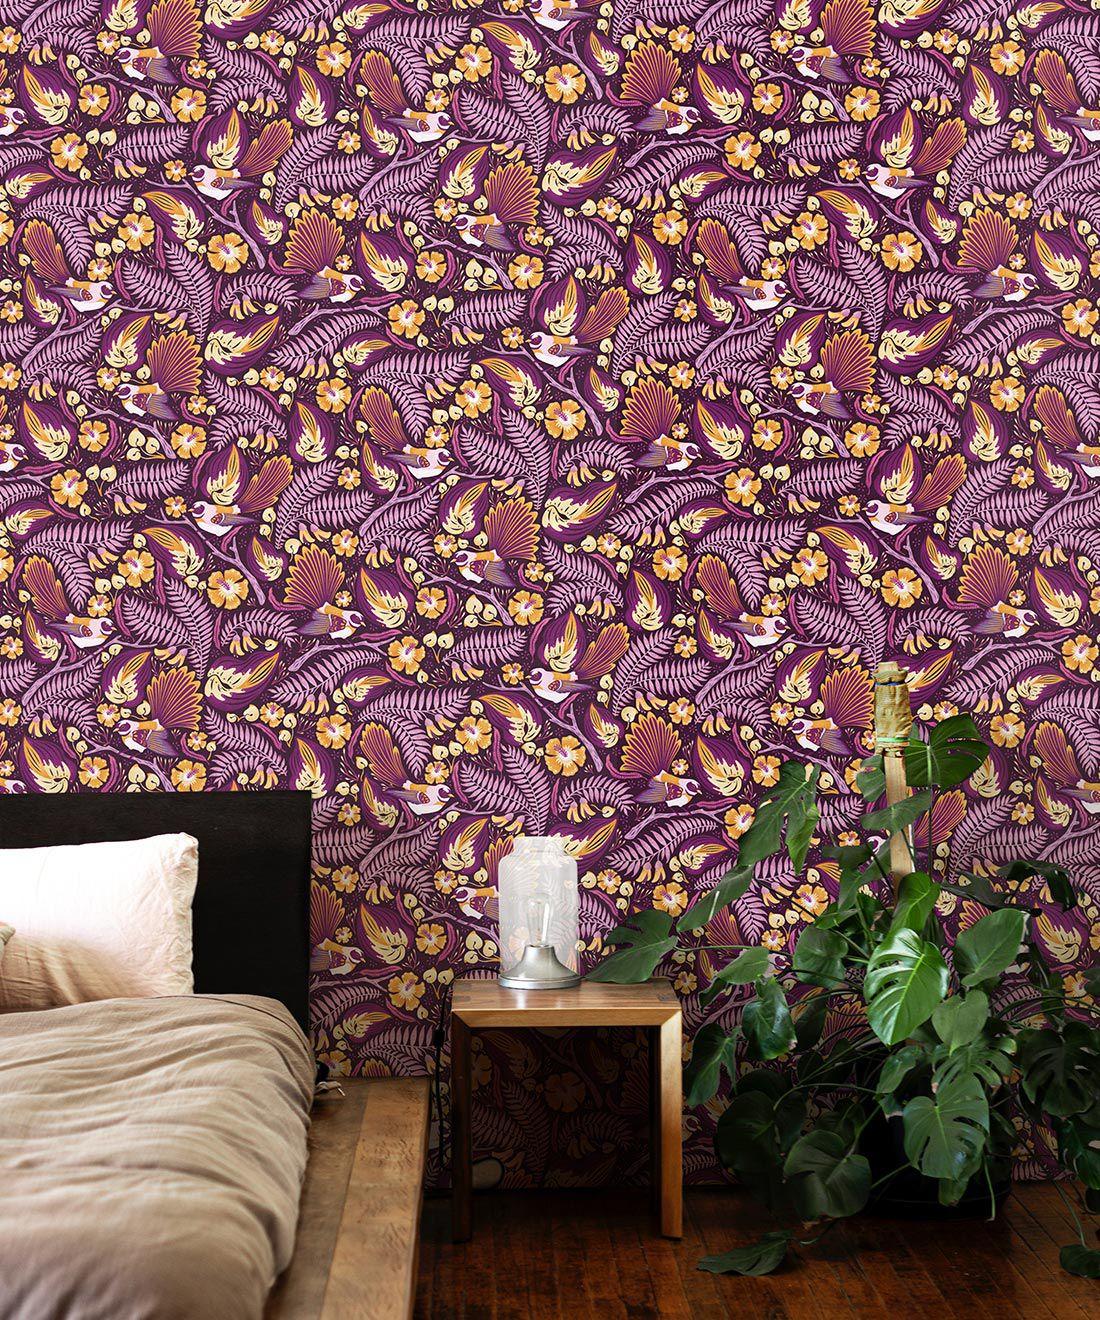 Faintails Wallpaper • New Zealand • Bird Wallpaper • Kowhai Tree • Kowhai Flowers • Purple Wallpaper •Insitu